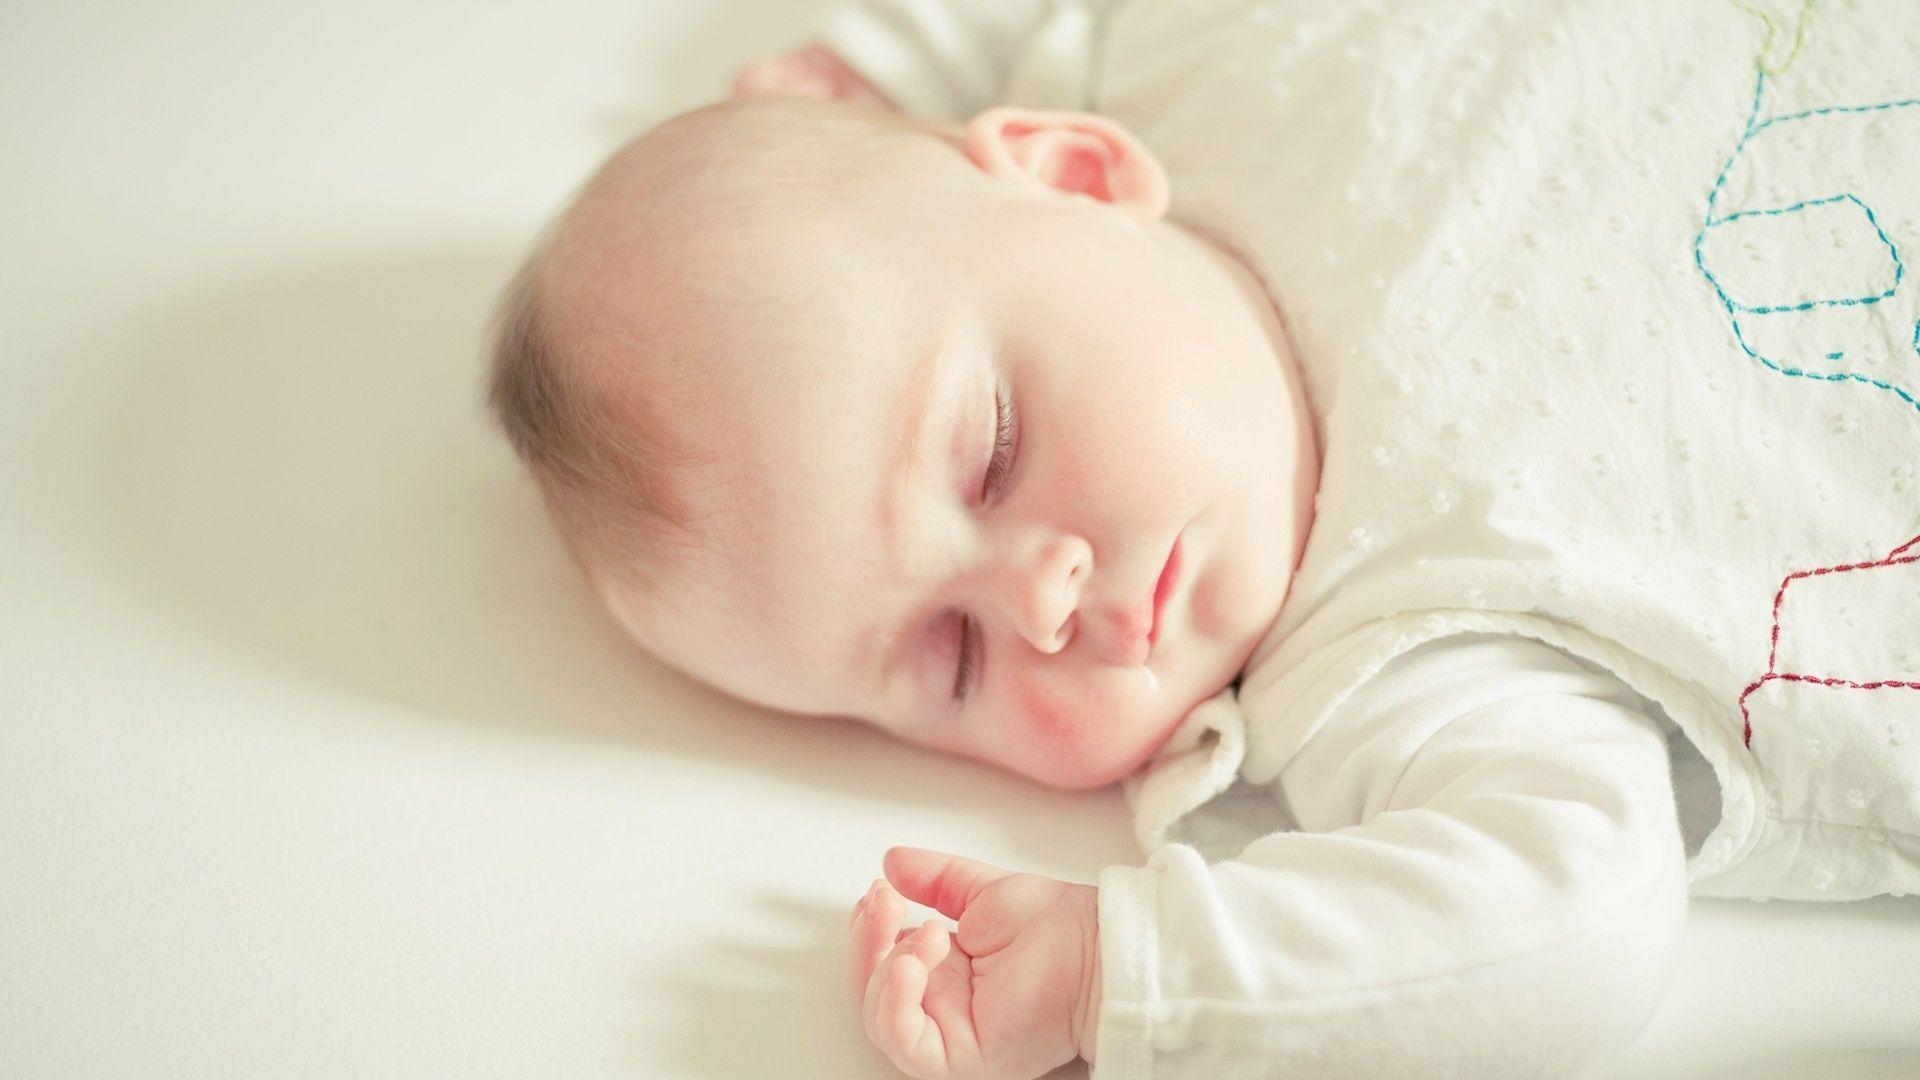 Sleep Baby Wallpapers Top Free Sleep Baby Backgrounds Wallpaperaccess